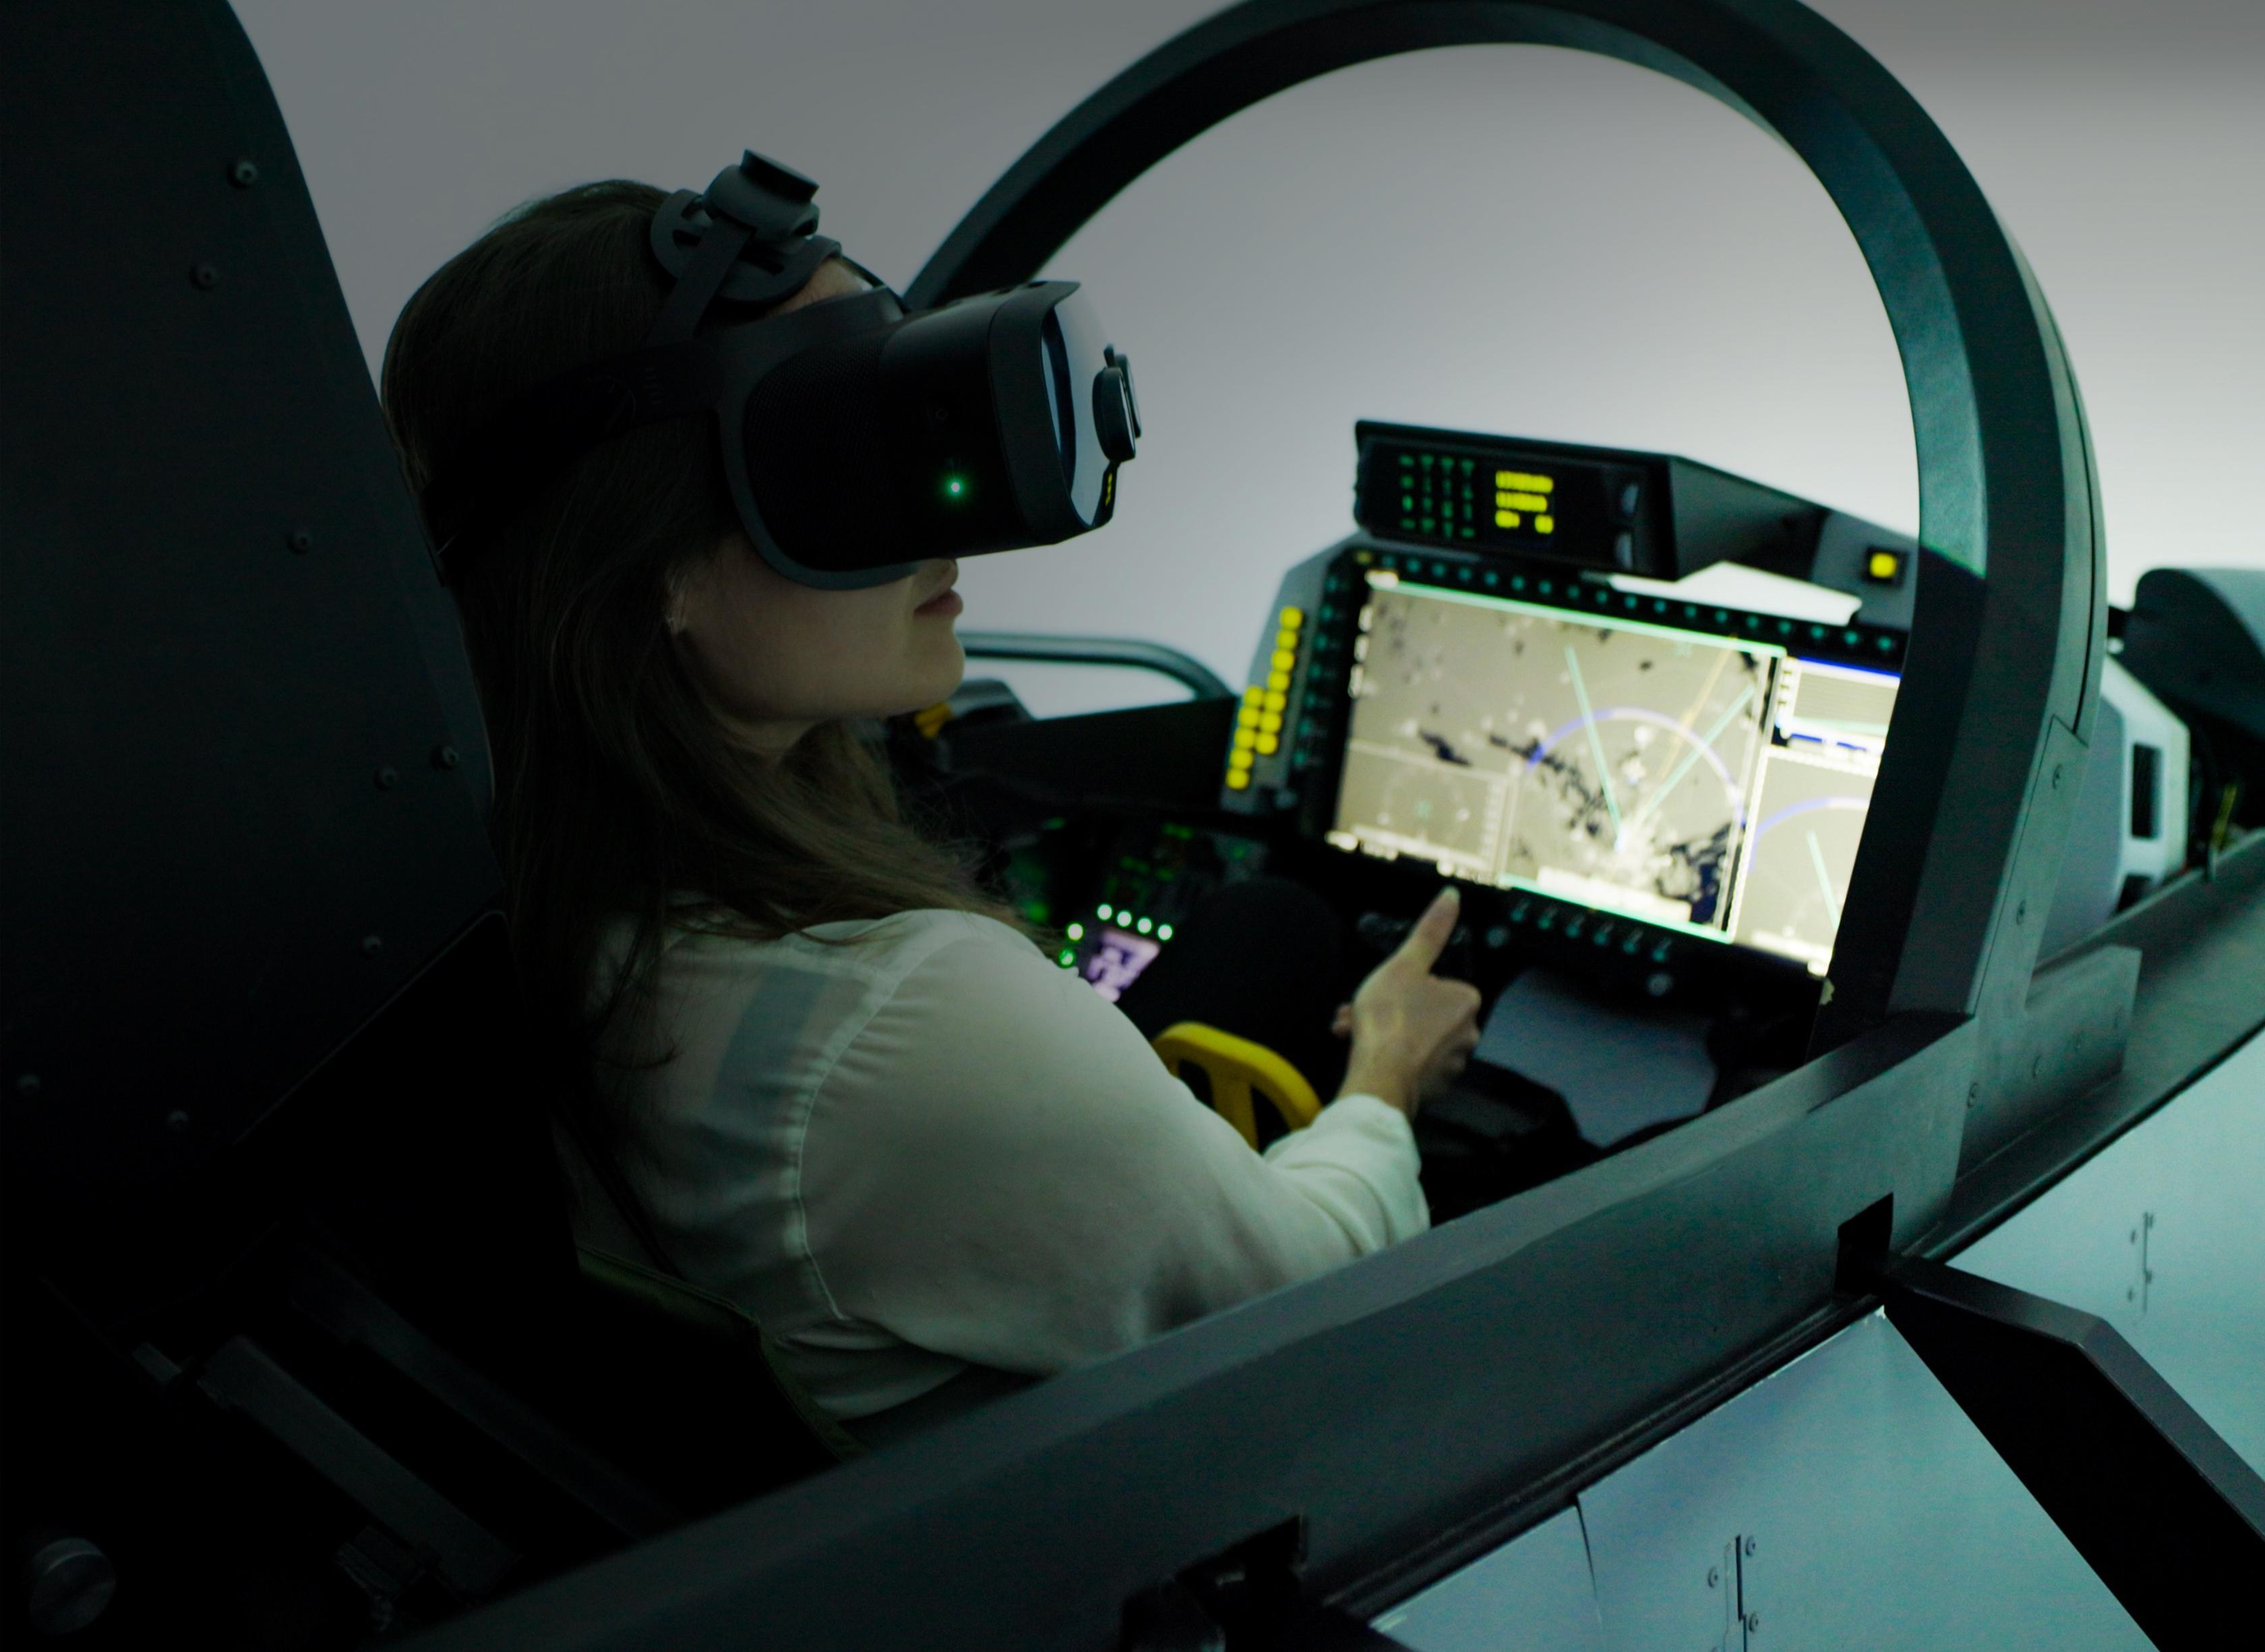 Saab and Varjo work together to revolutionize flight simulators. Varjo's mixed reality technology will be integrated into all Saab Gripen E/F simulators.